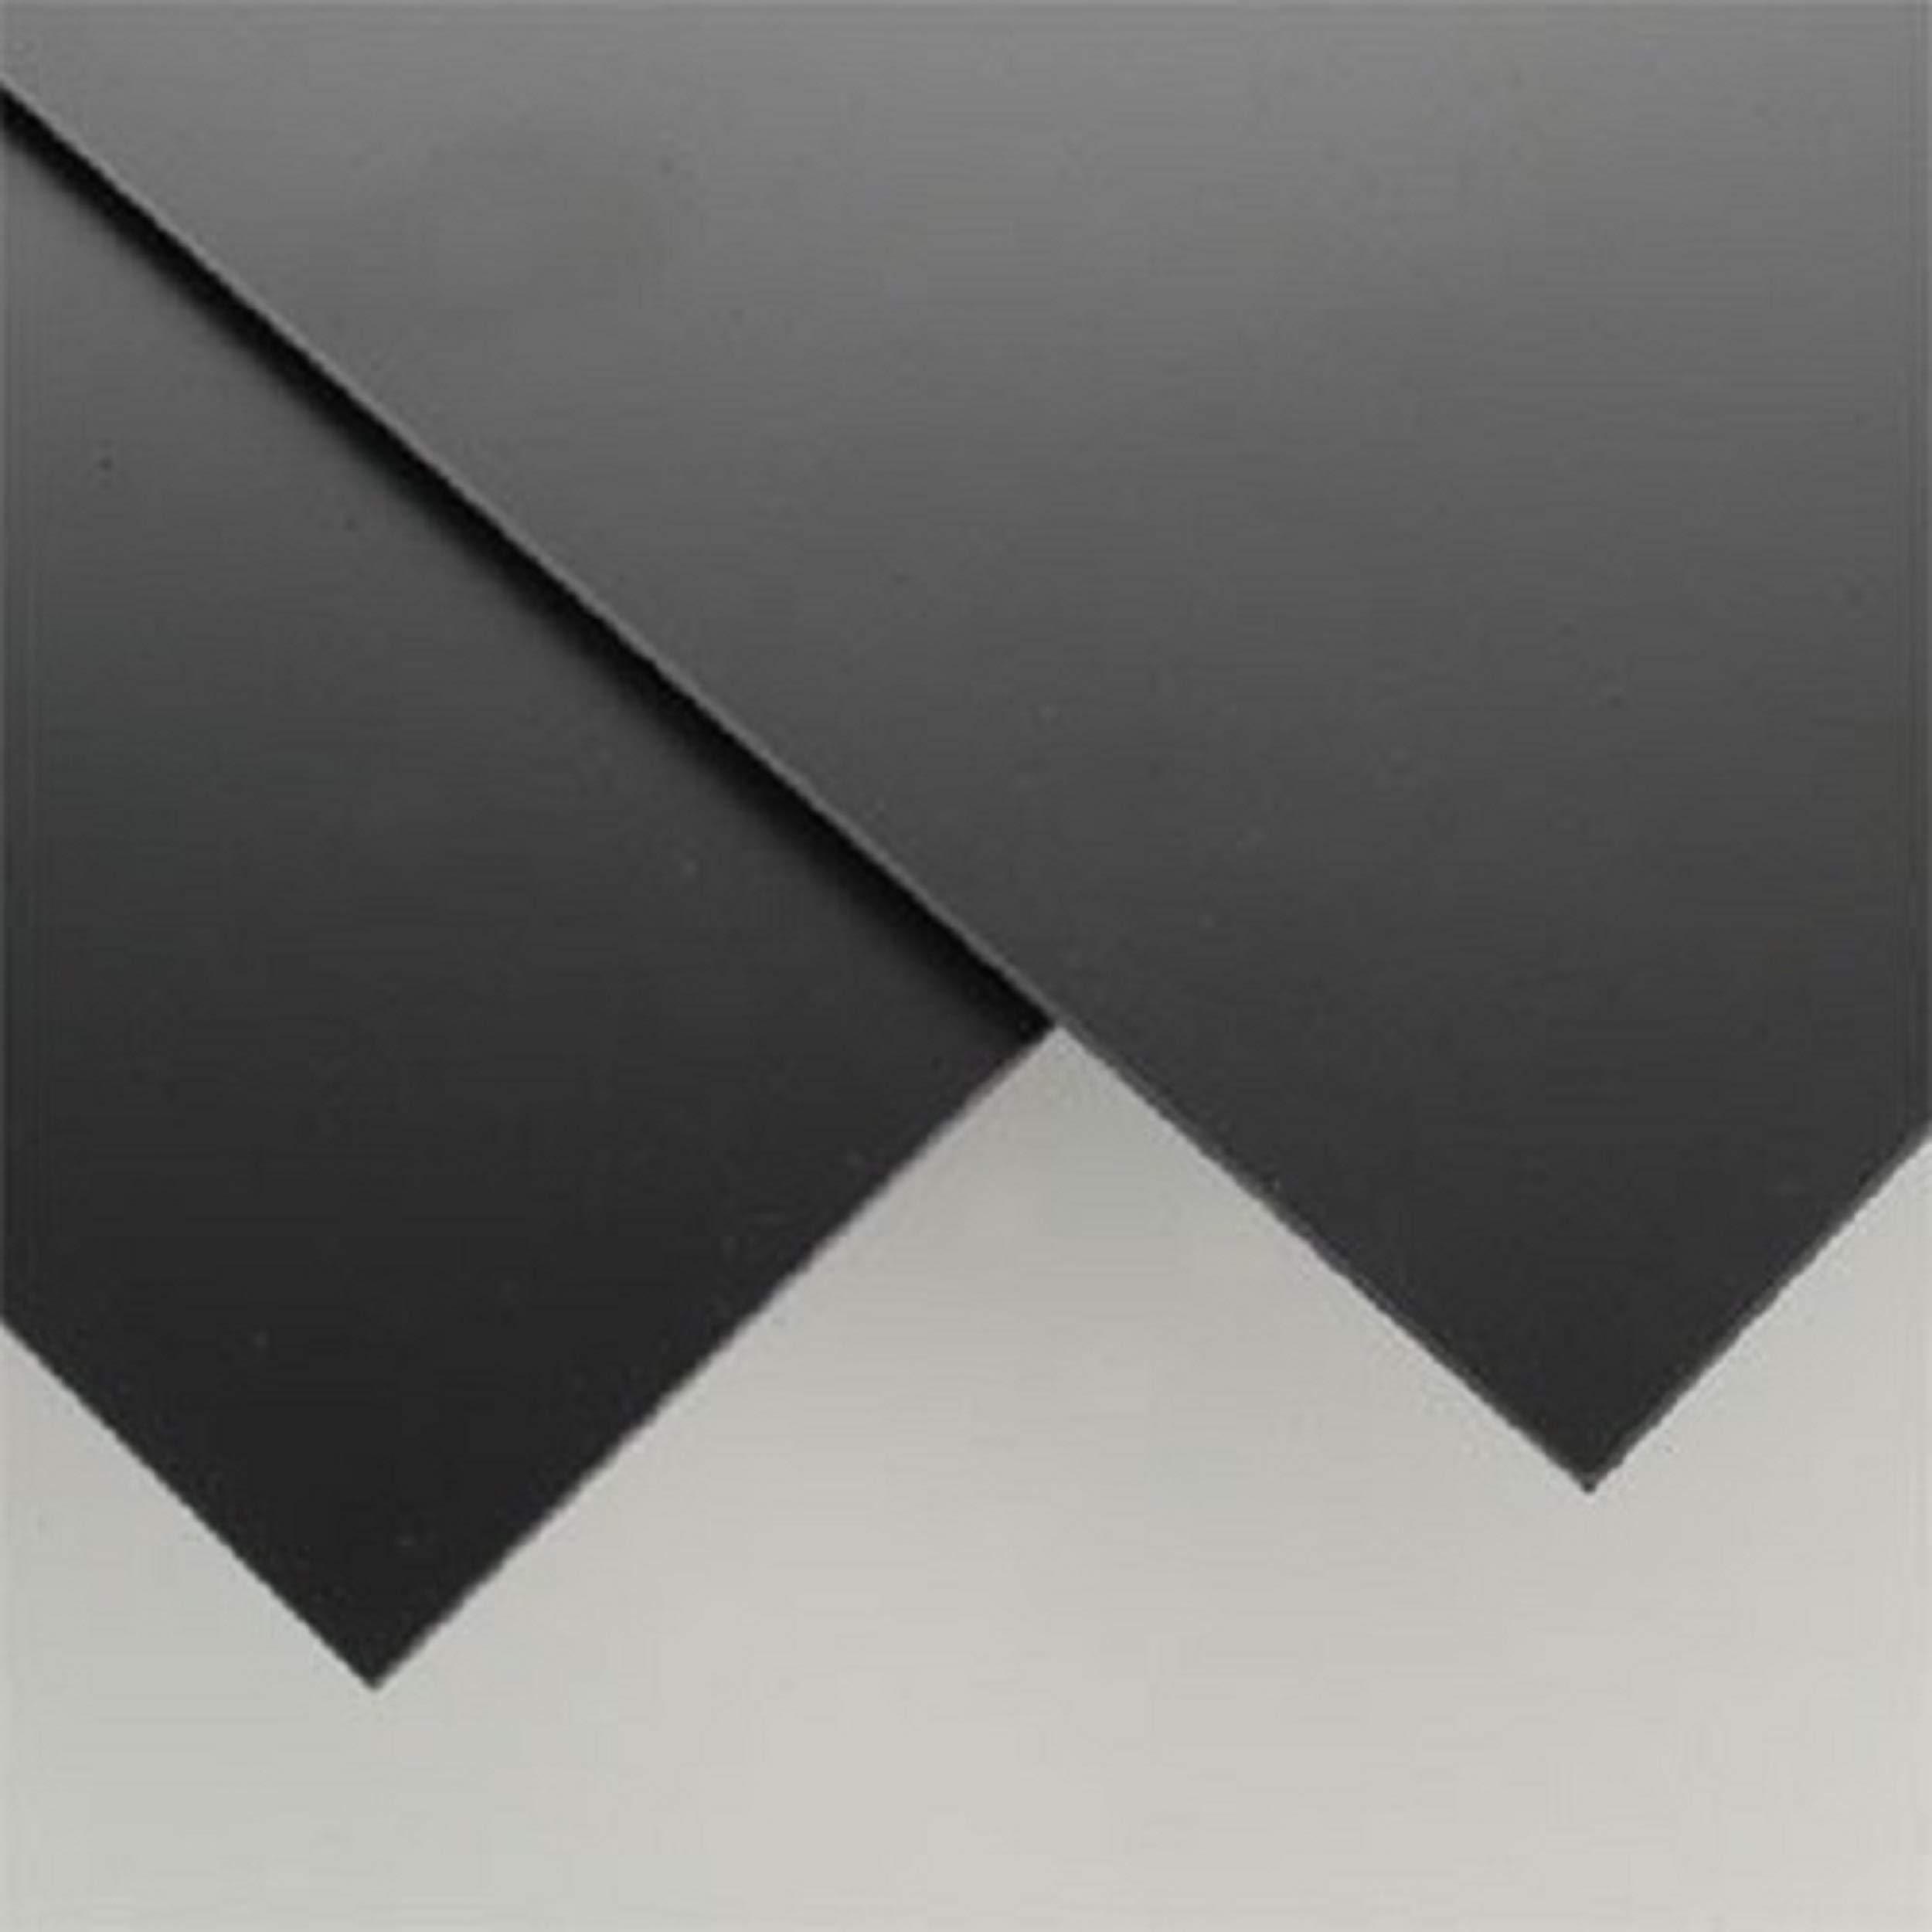 SIBE-R-PLASTIC SUPPLY Black Styrene Sheets .06'' x 6'' x 12''